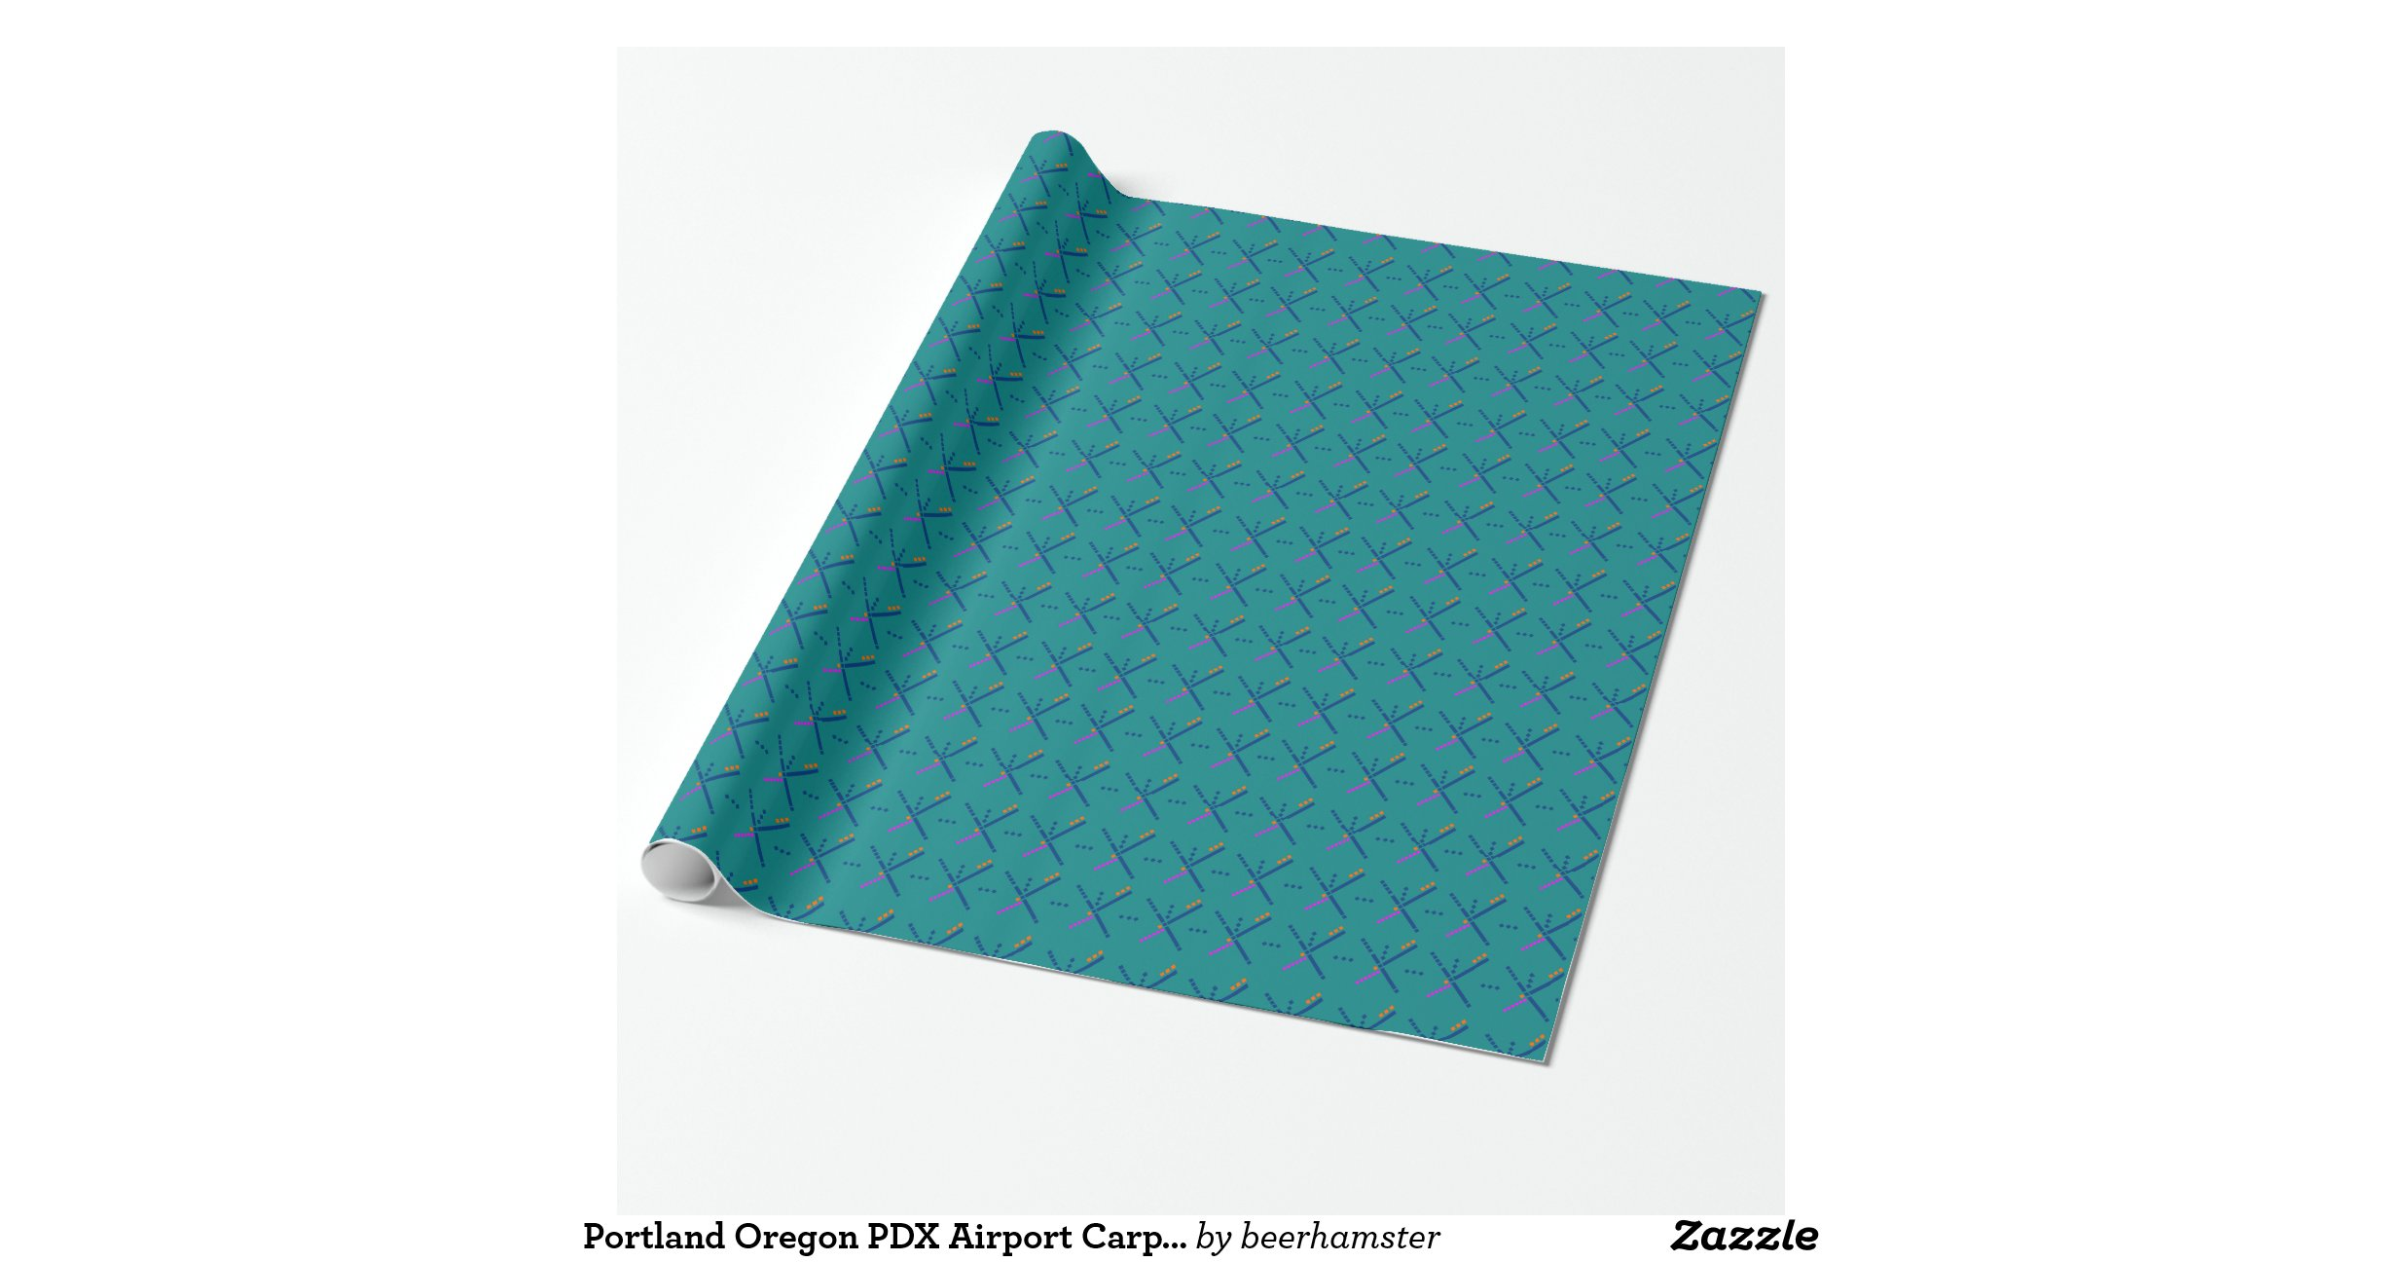 Portland Oregon PDX Airport Carpet Wrapping Paper Zazzle